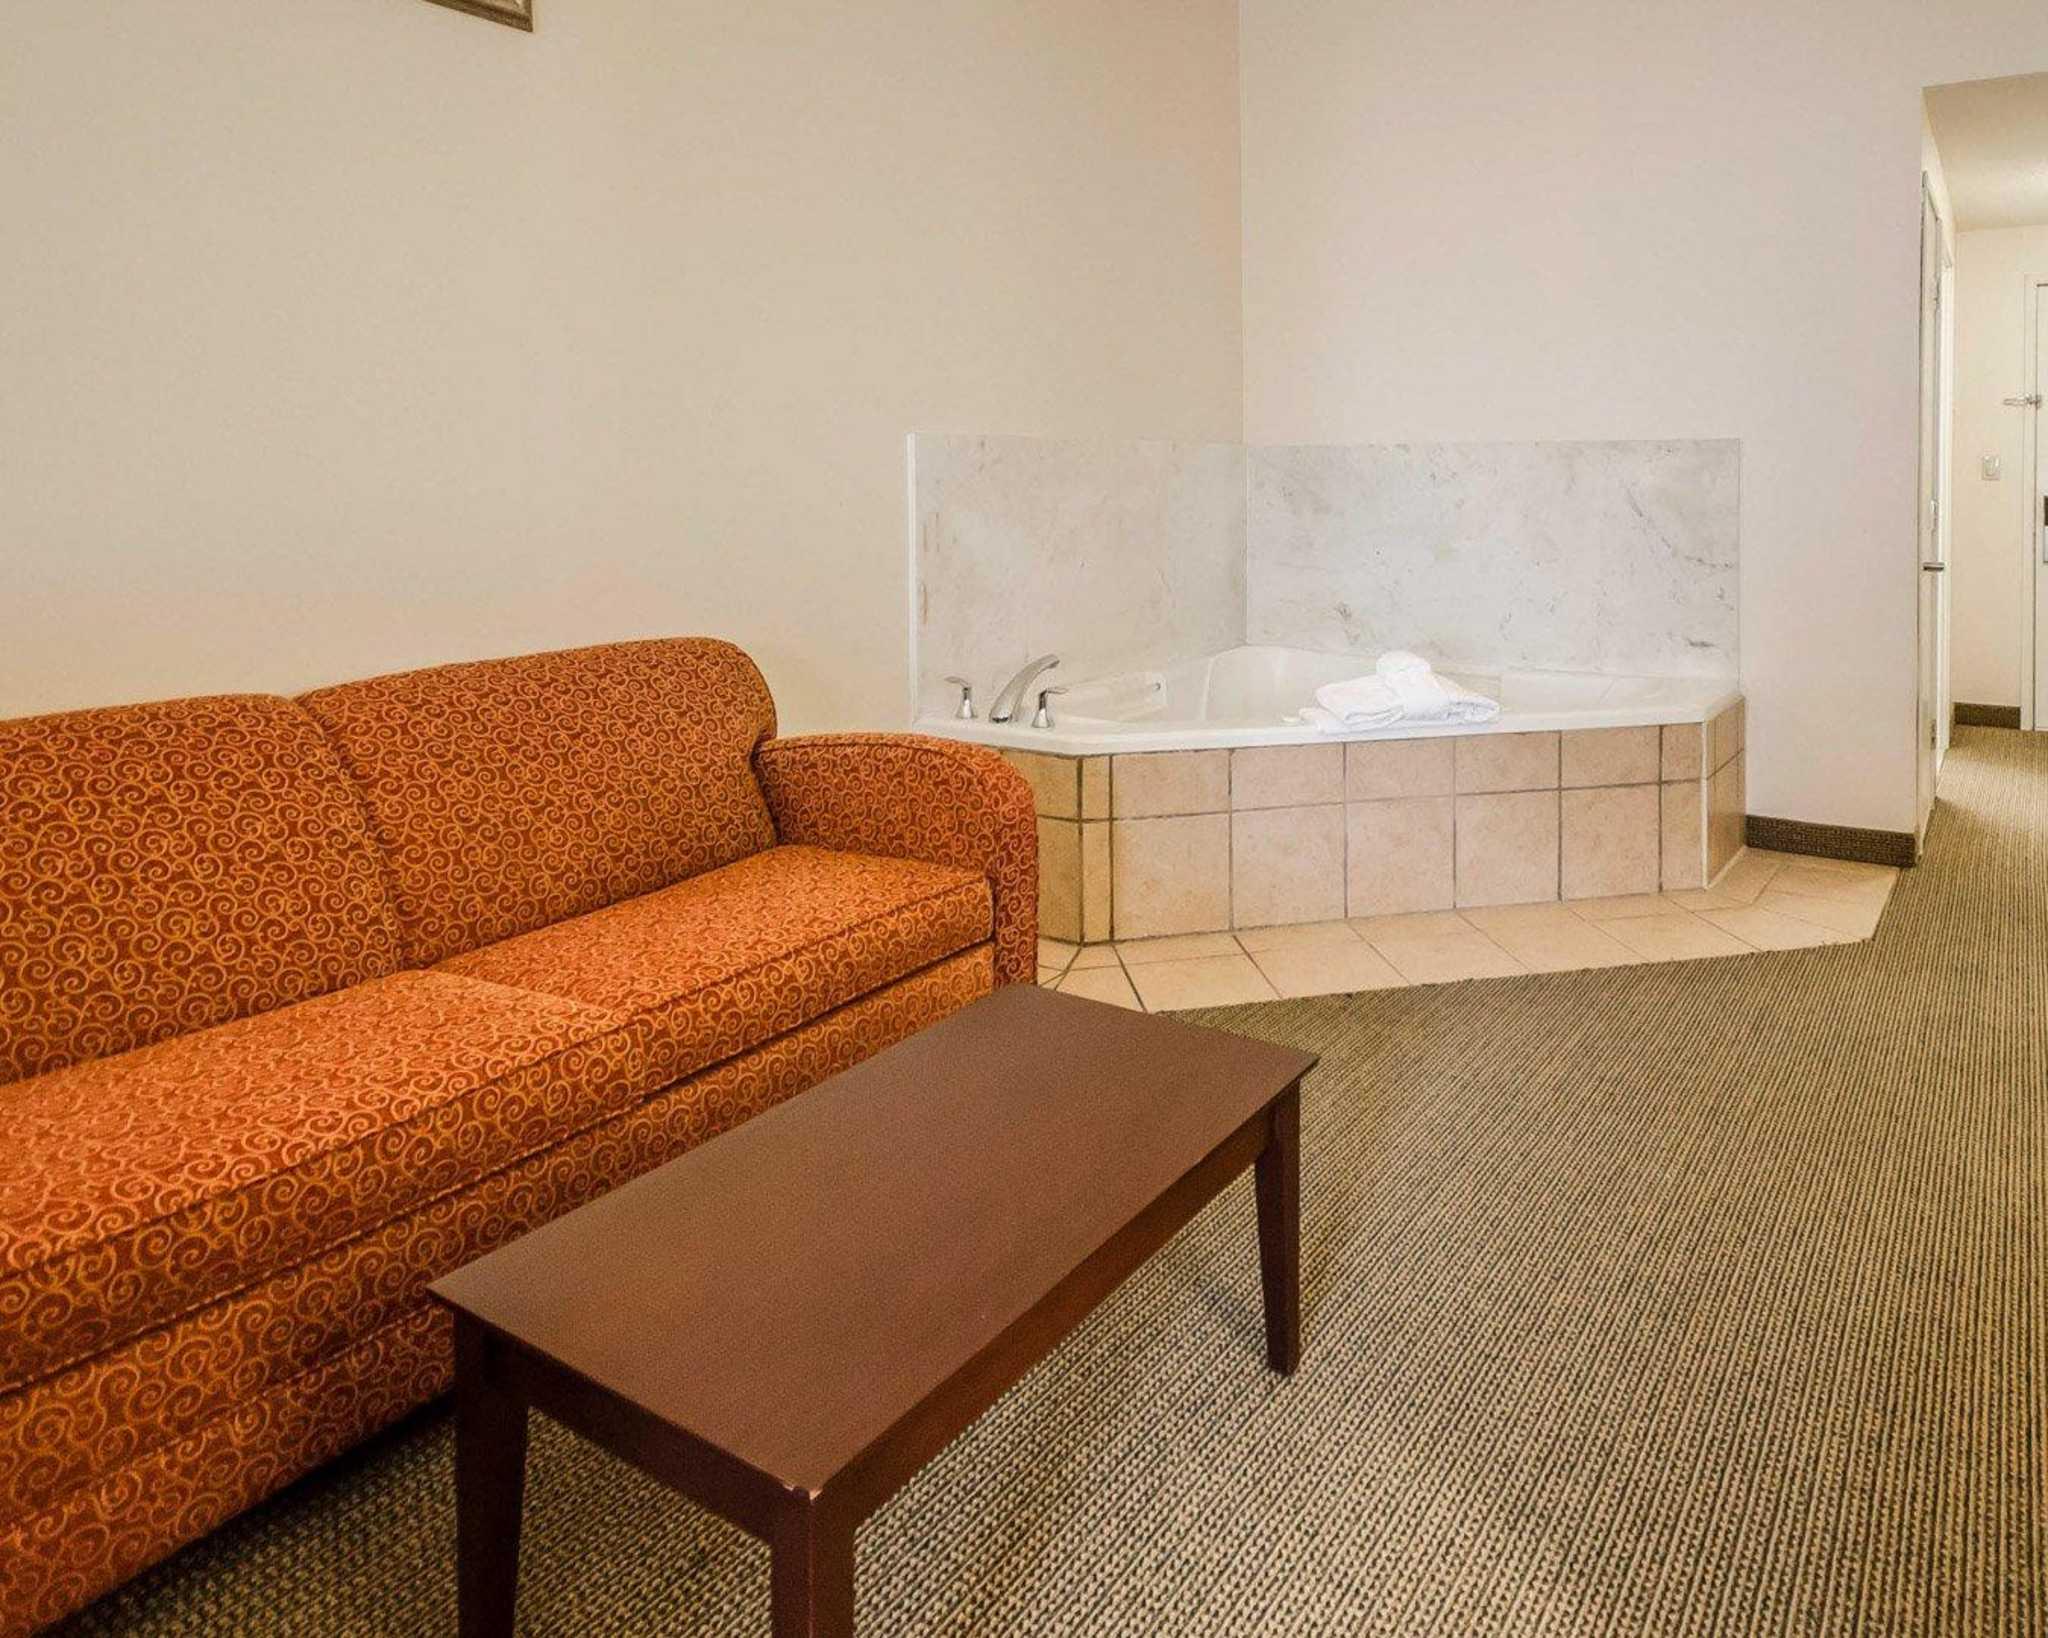 Quality Suites image 18